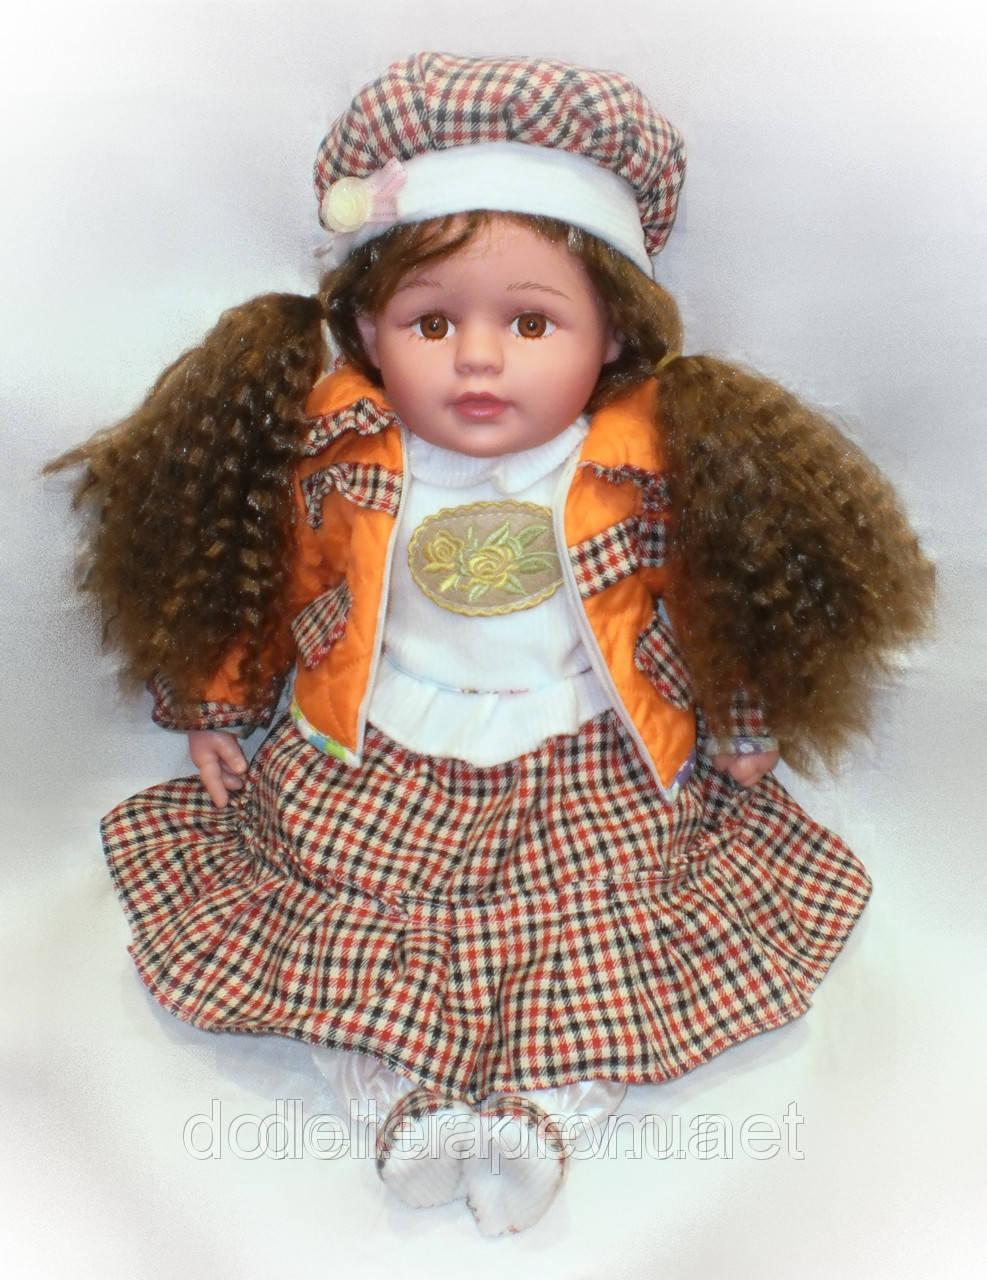 Детская кукла Лена